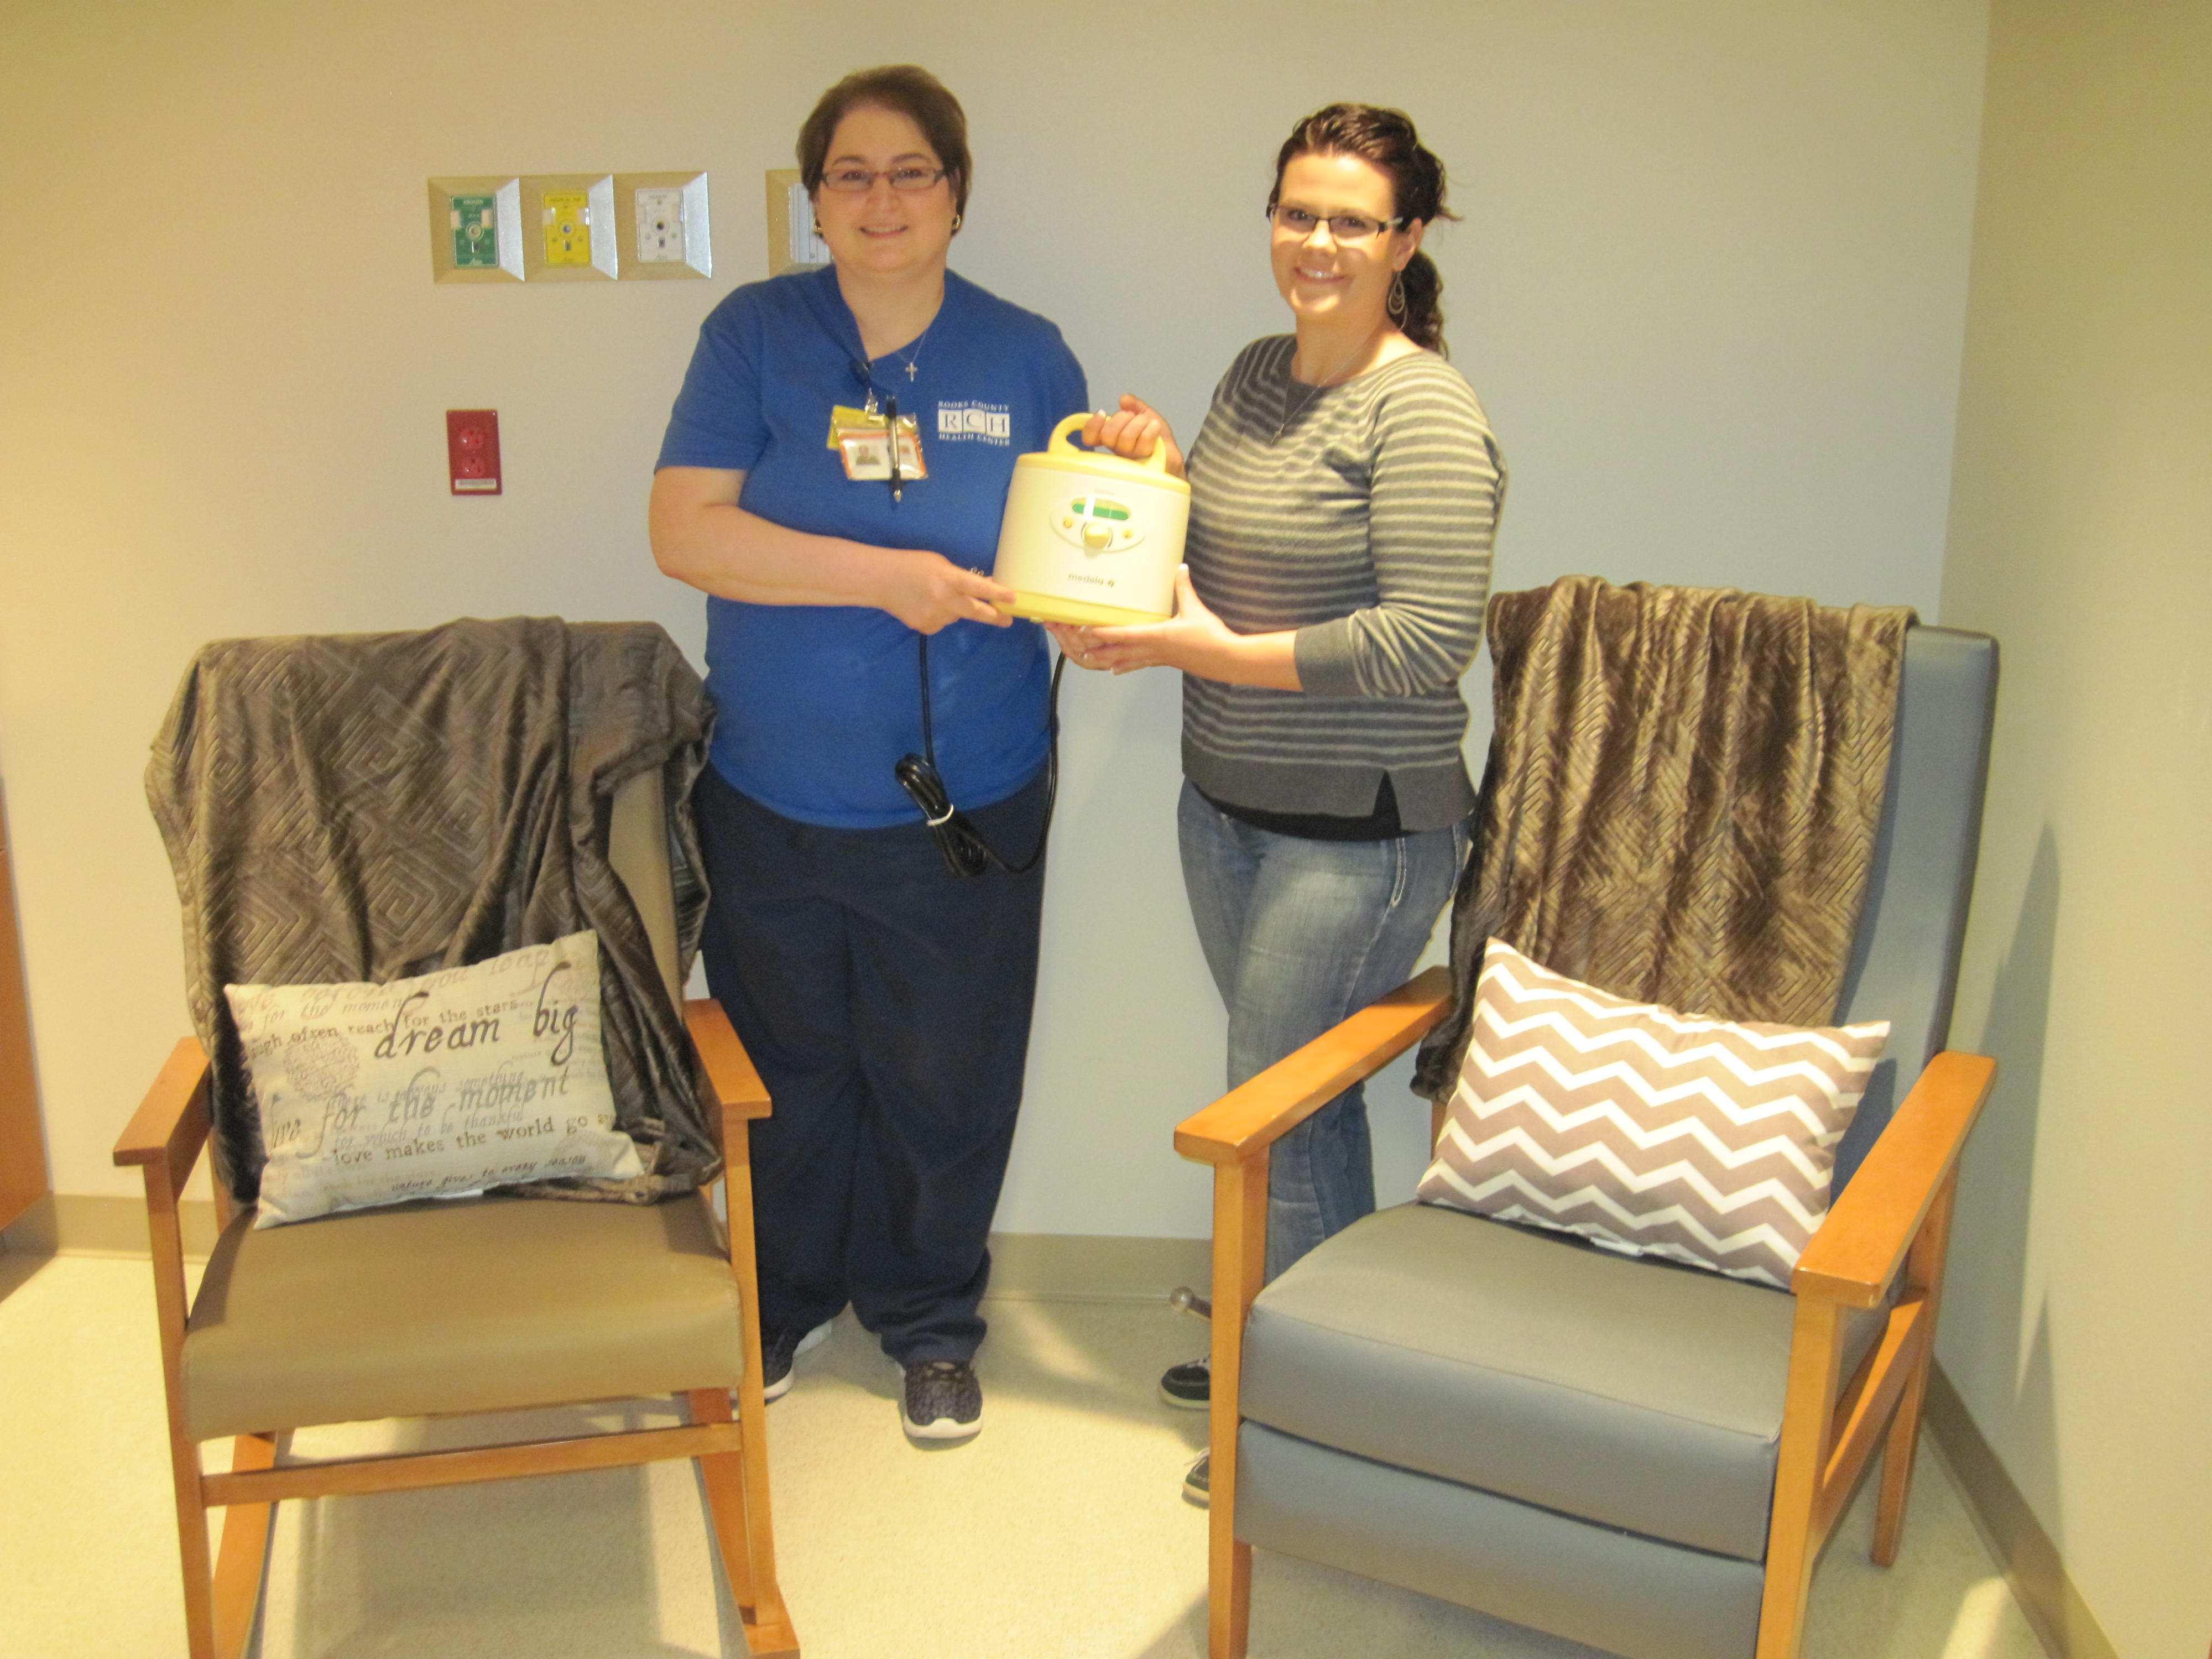 rooks county health center plainville kansas breastfeeding nursing mothers lactation room